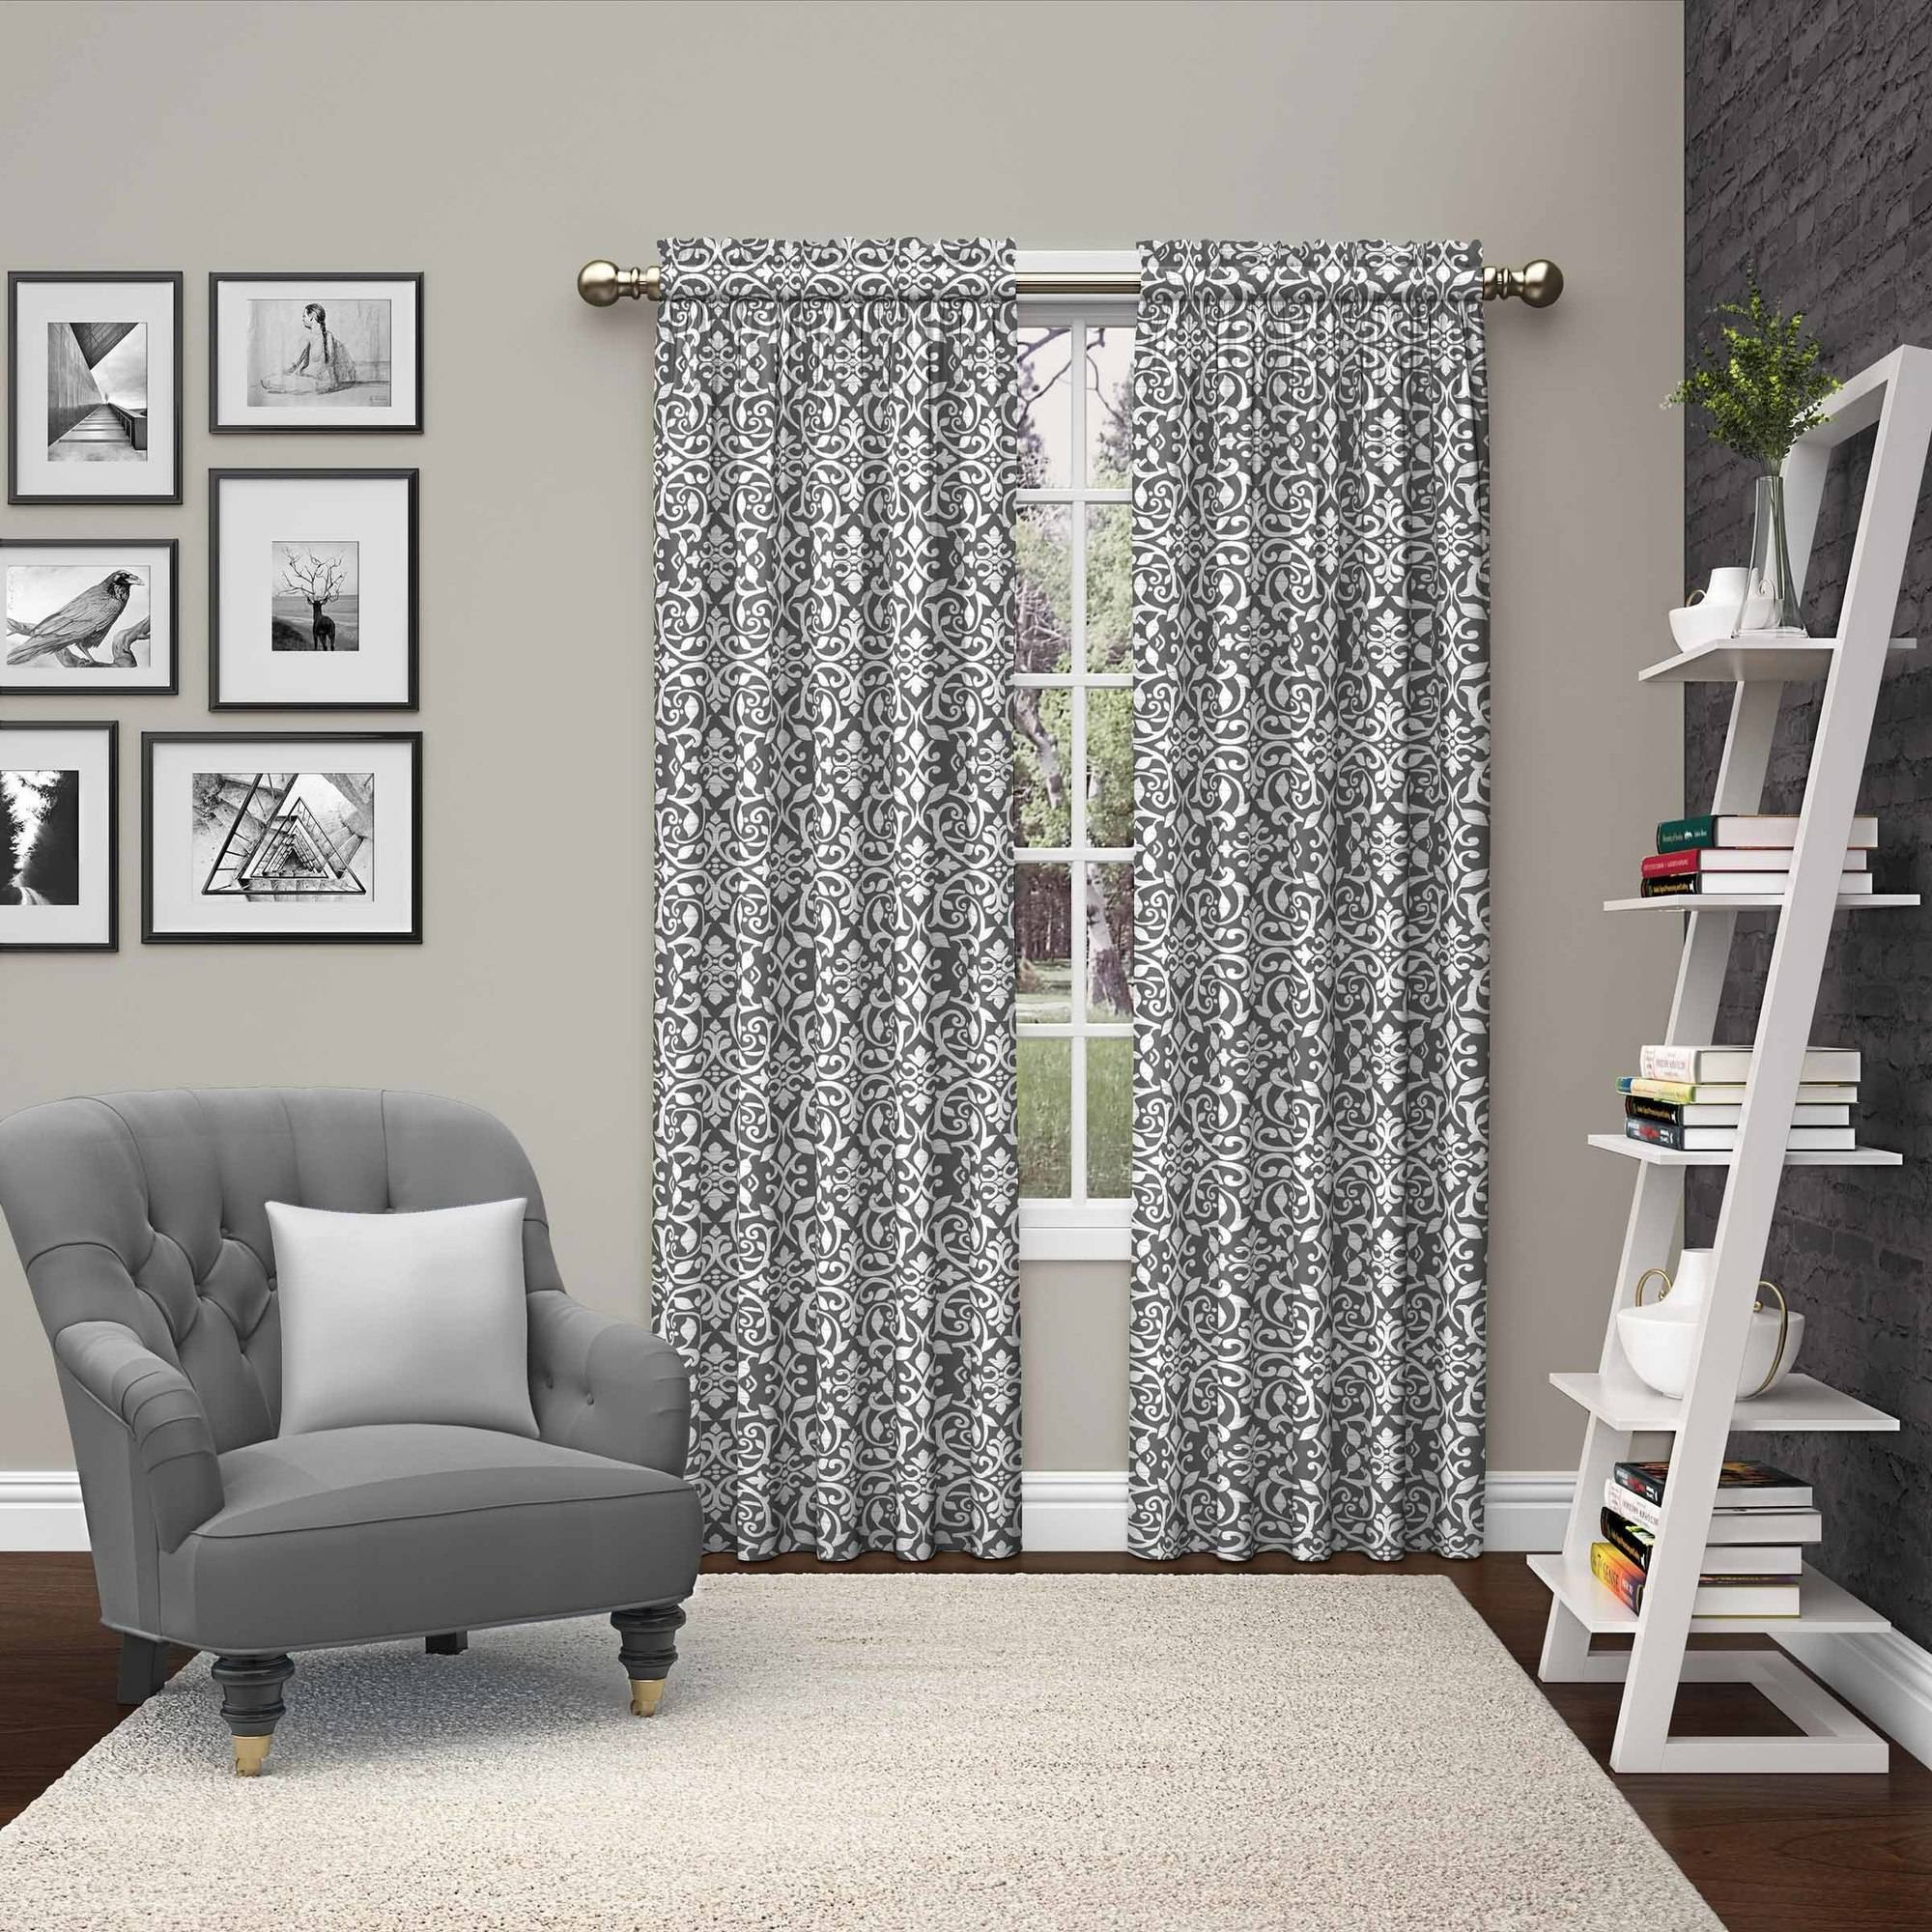 Mainstays Greek Key Fashion Window Curtain Panels, Set of 2 ...